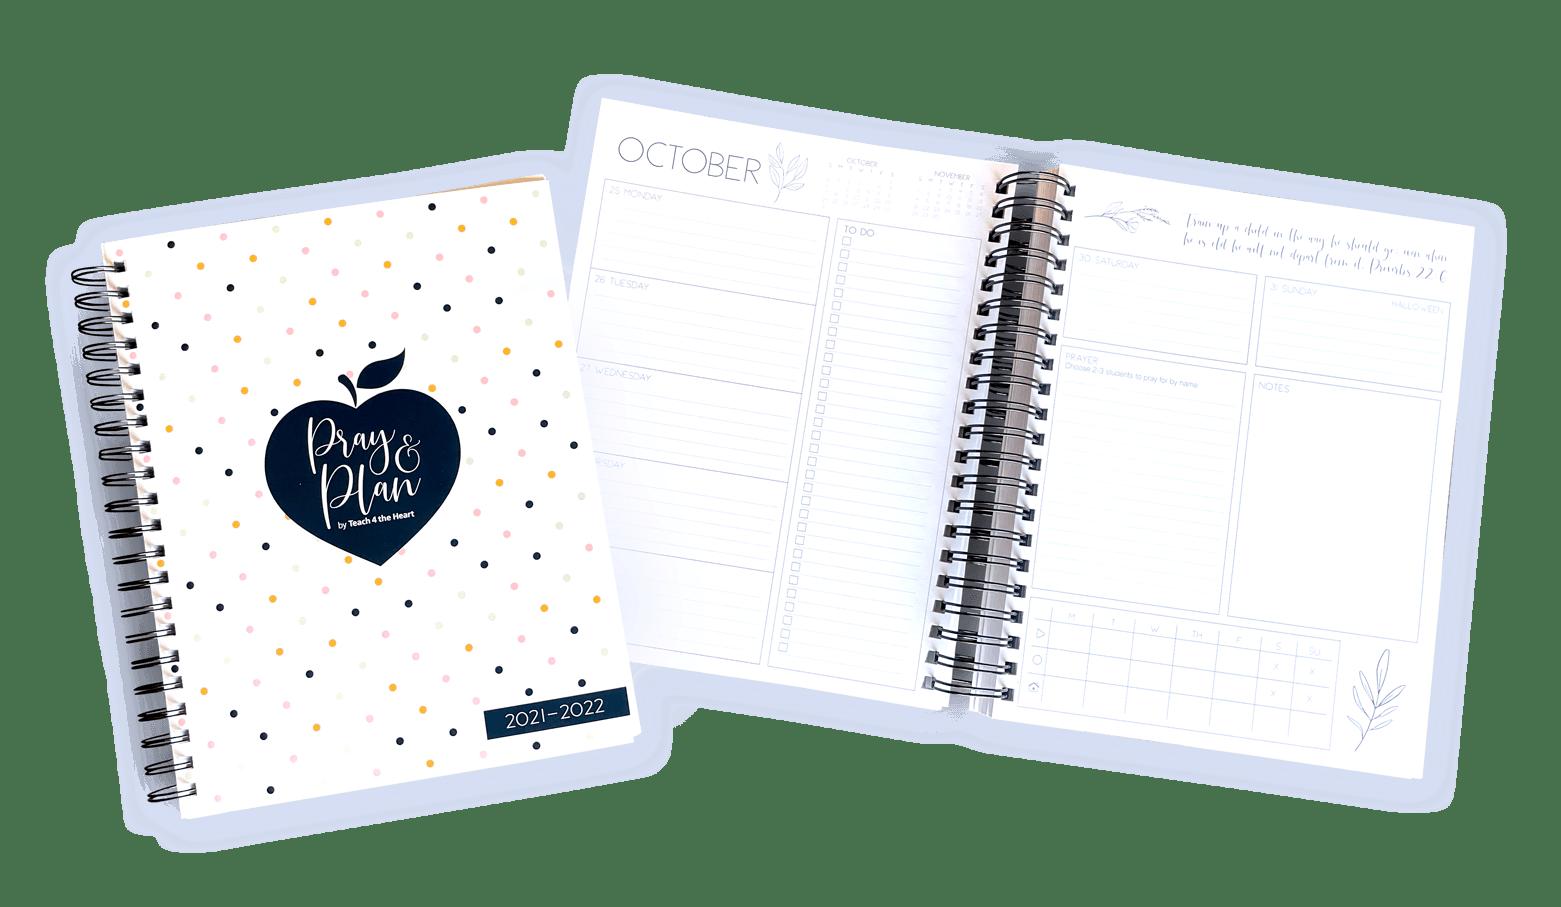 Pray & Plan Planner